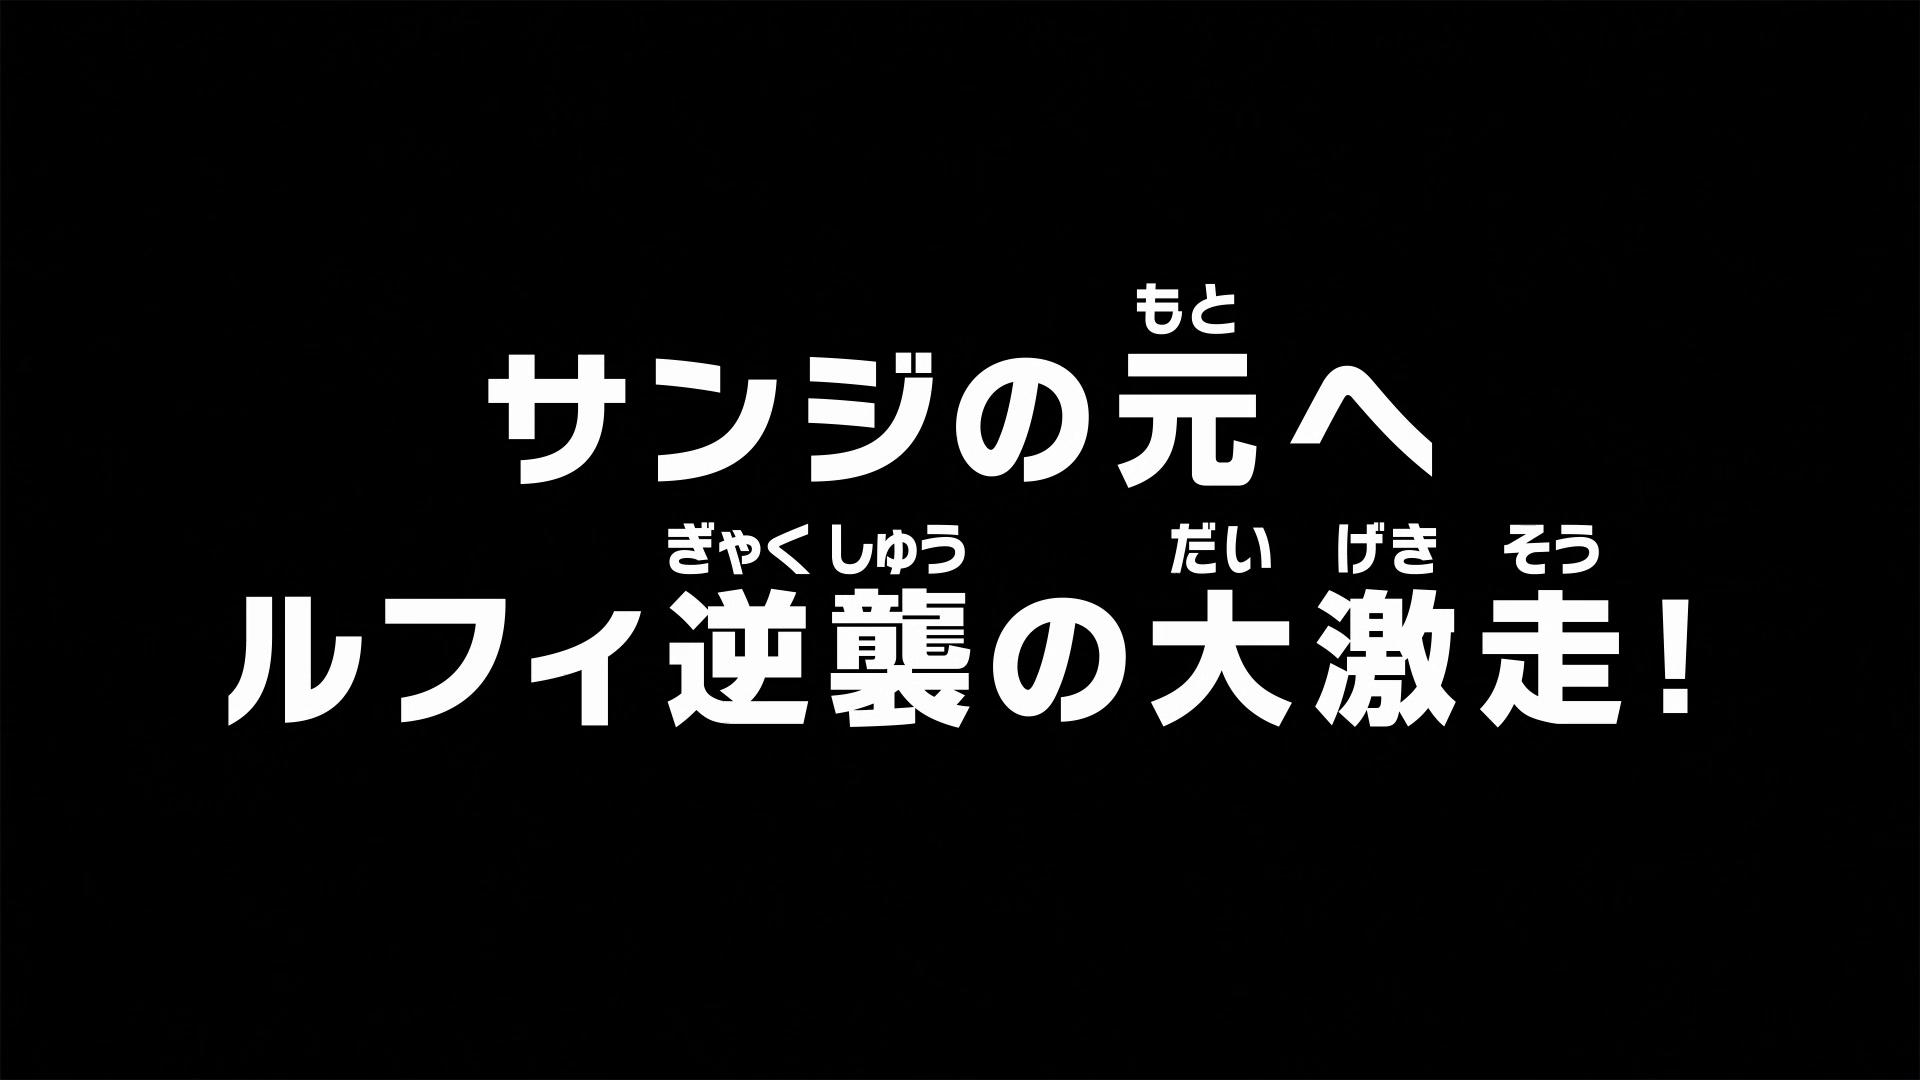 Episode 820